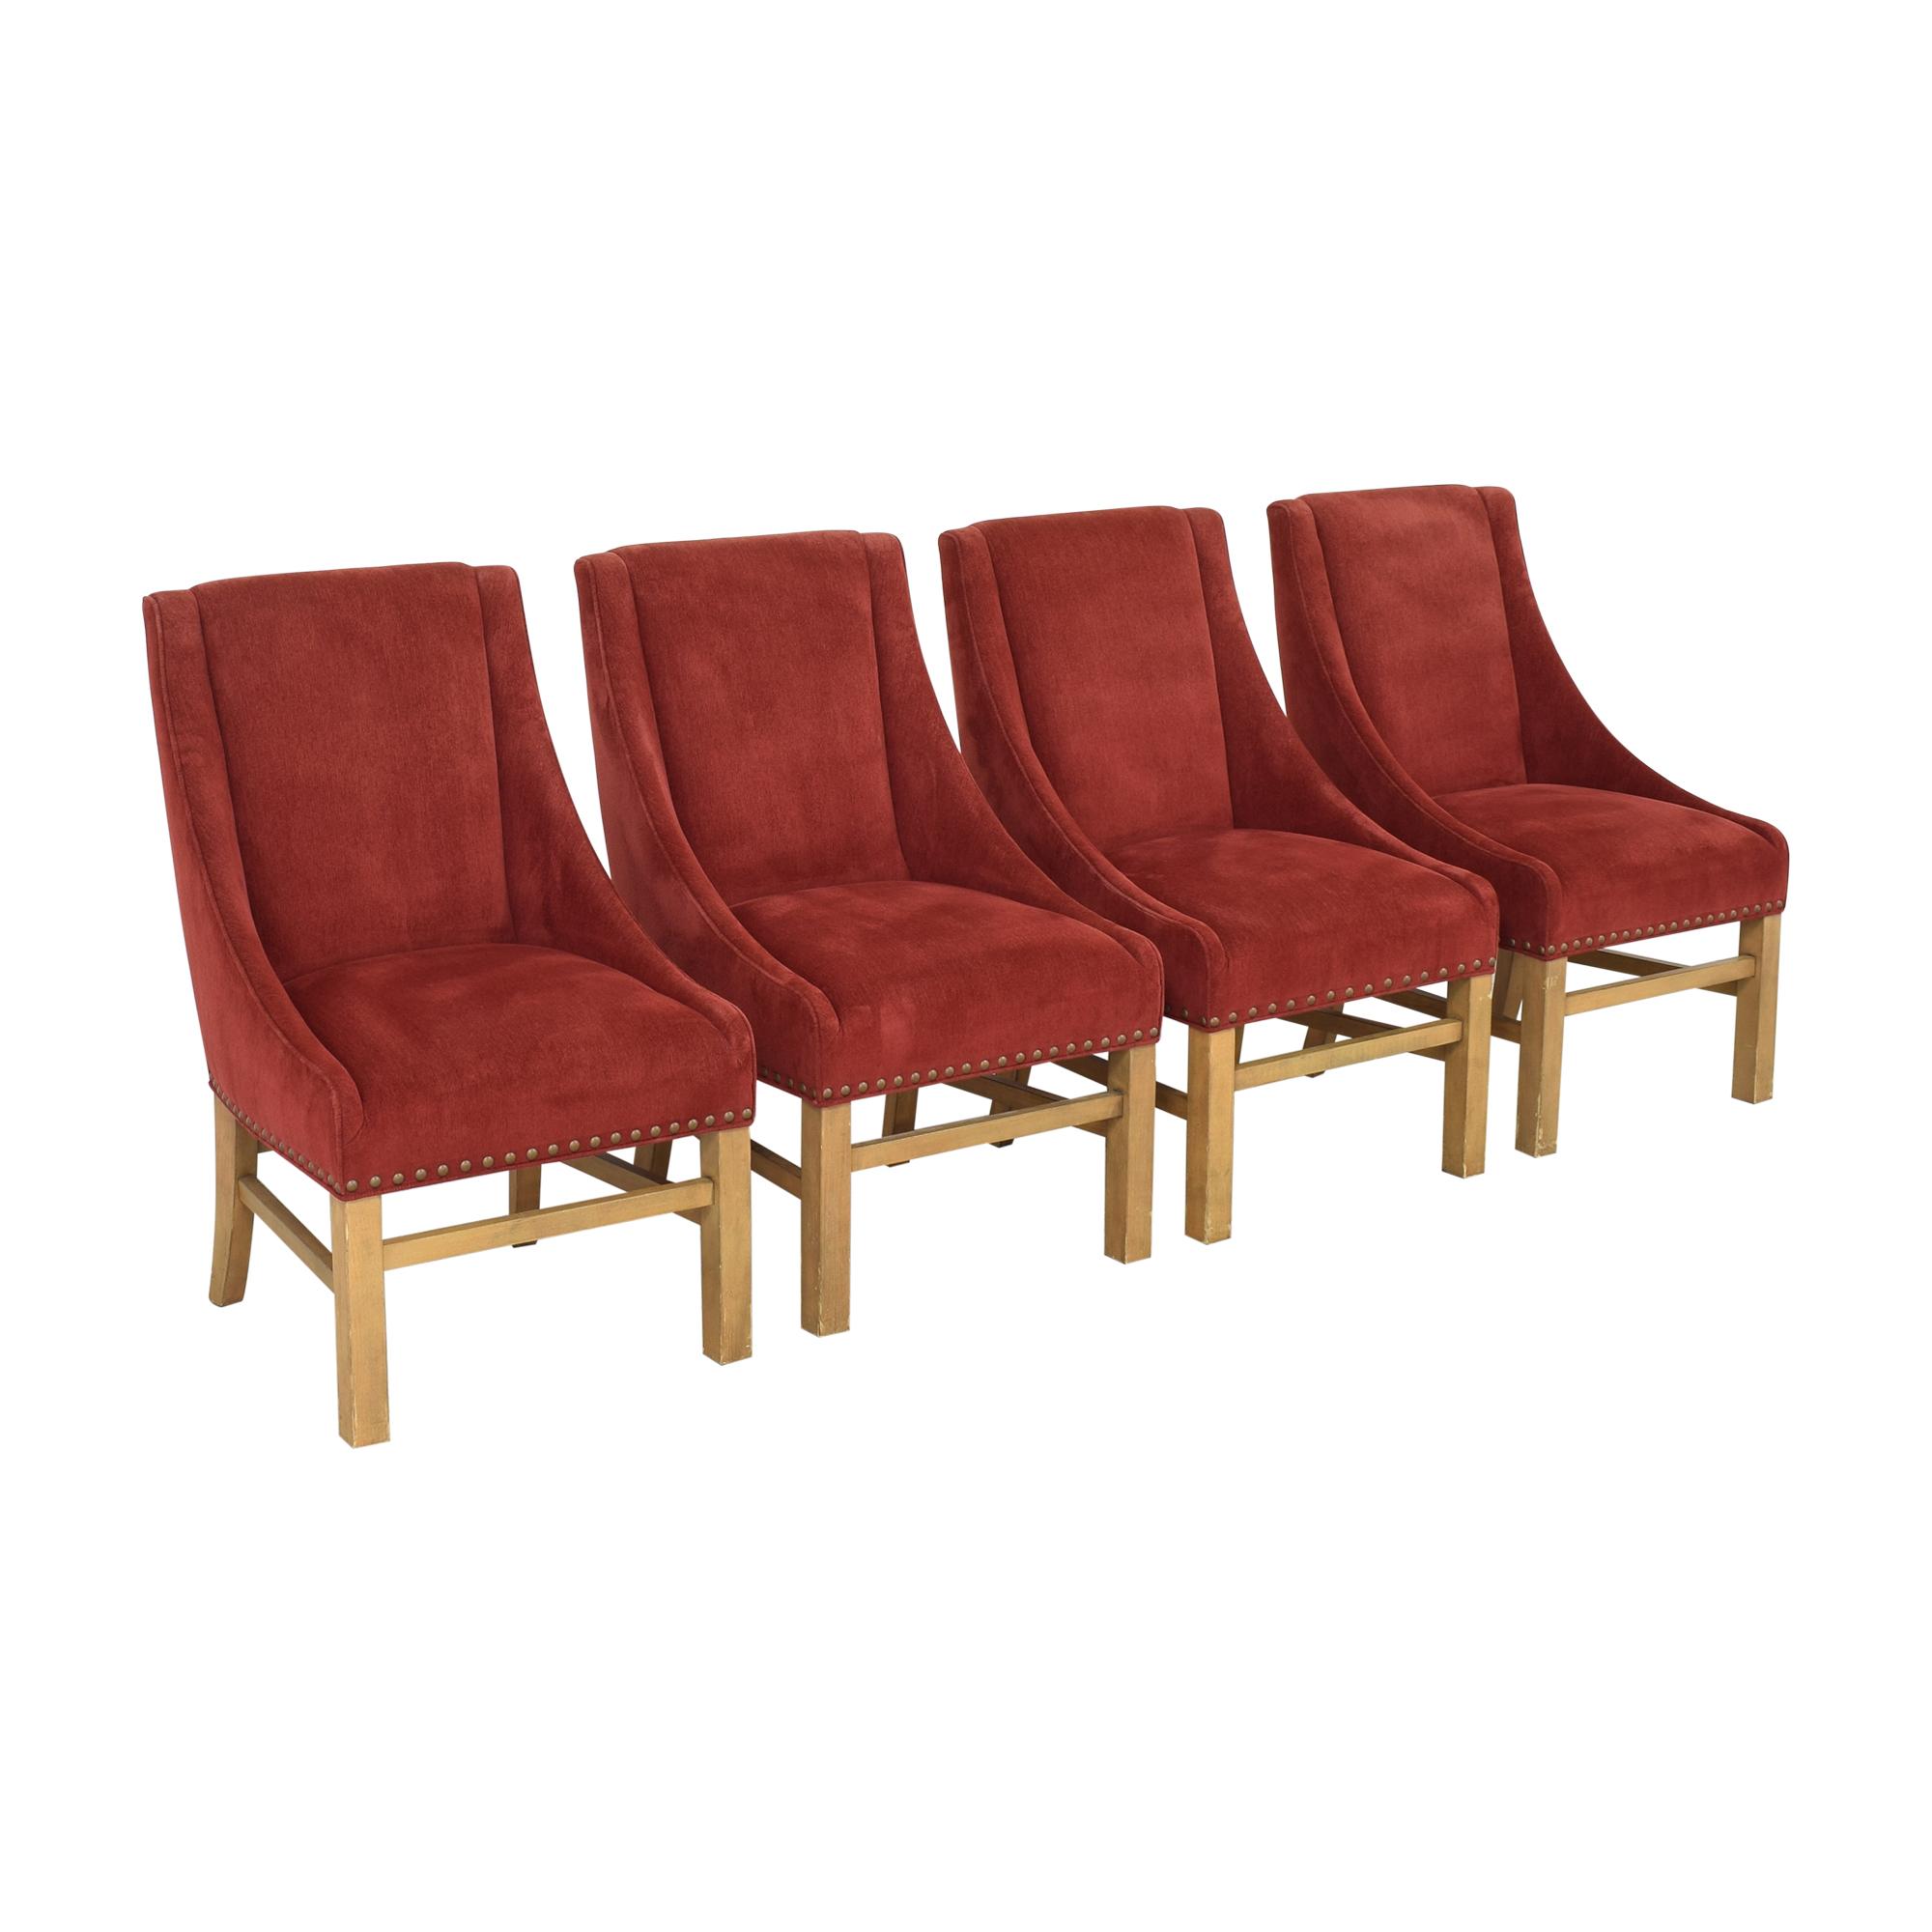 Bernhardt Bernhardt Upholstered Dining Chairs used